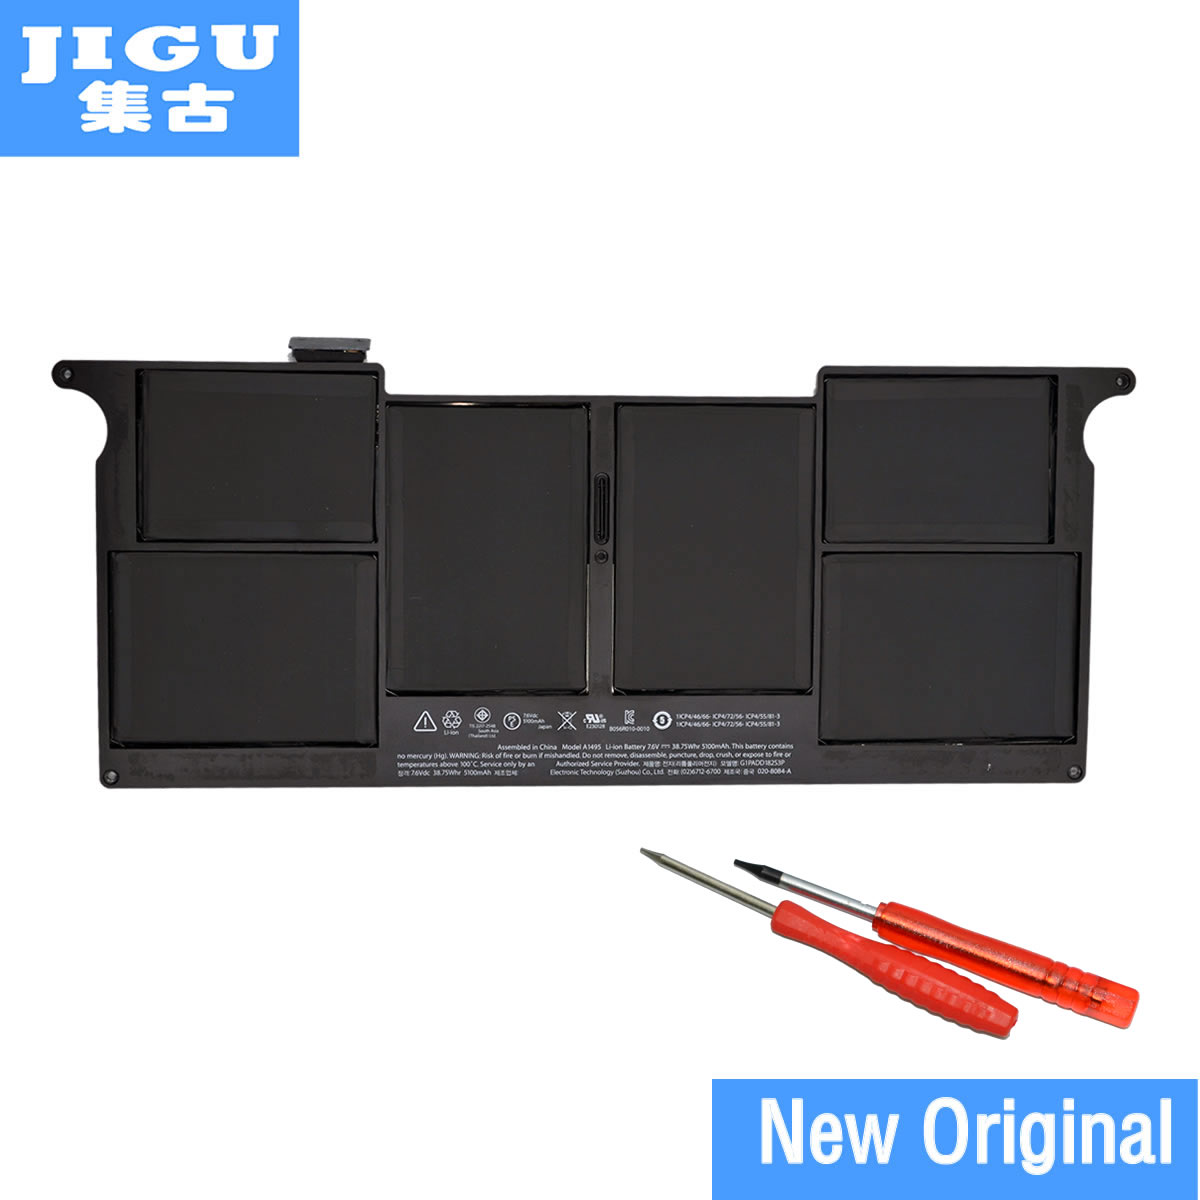 JIGU A1406 новый ноутбук Батарея для Apple MacBook Air 11 A1465 2012 A1370 2011 производства A1495 оригинальный Батарея